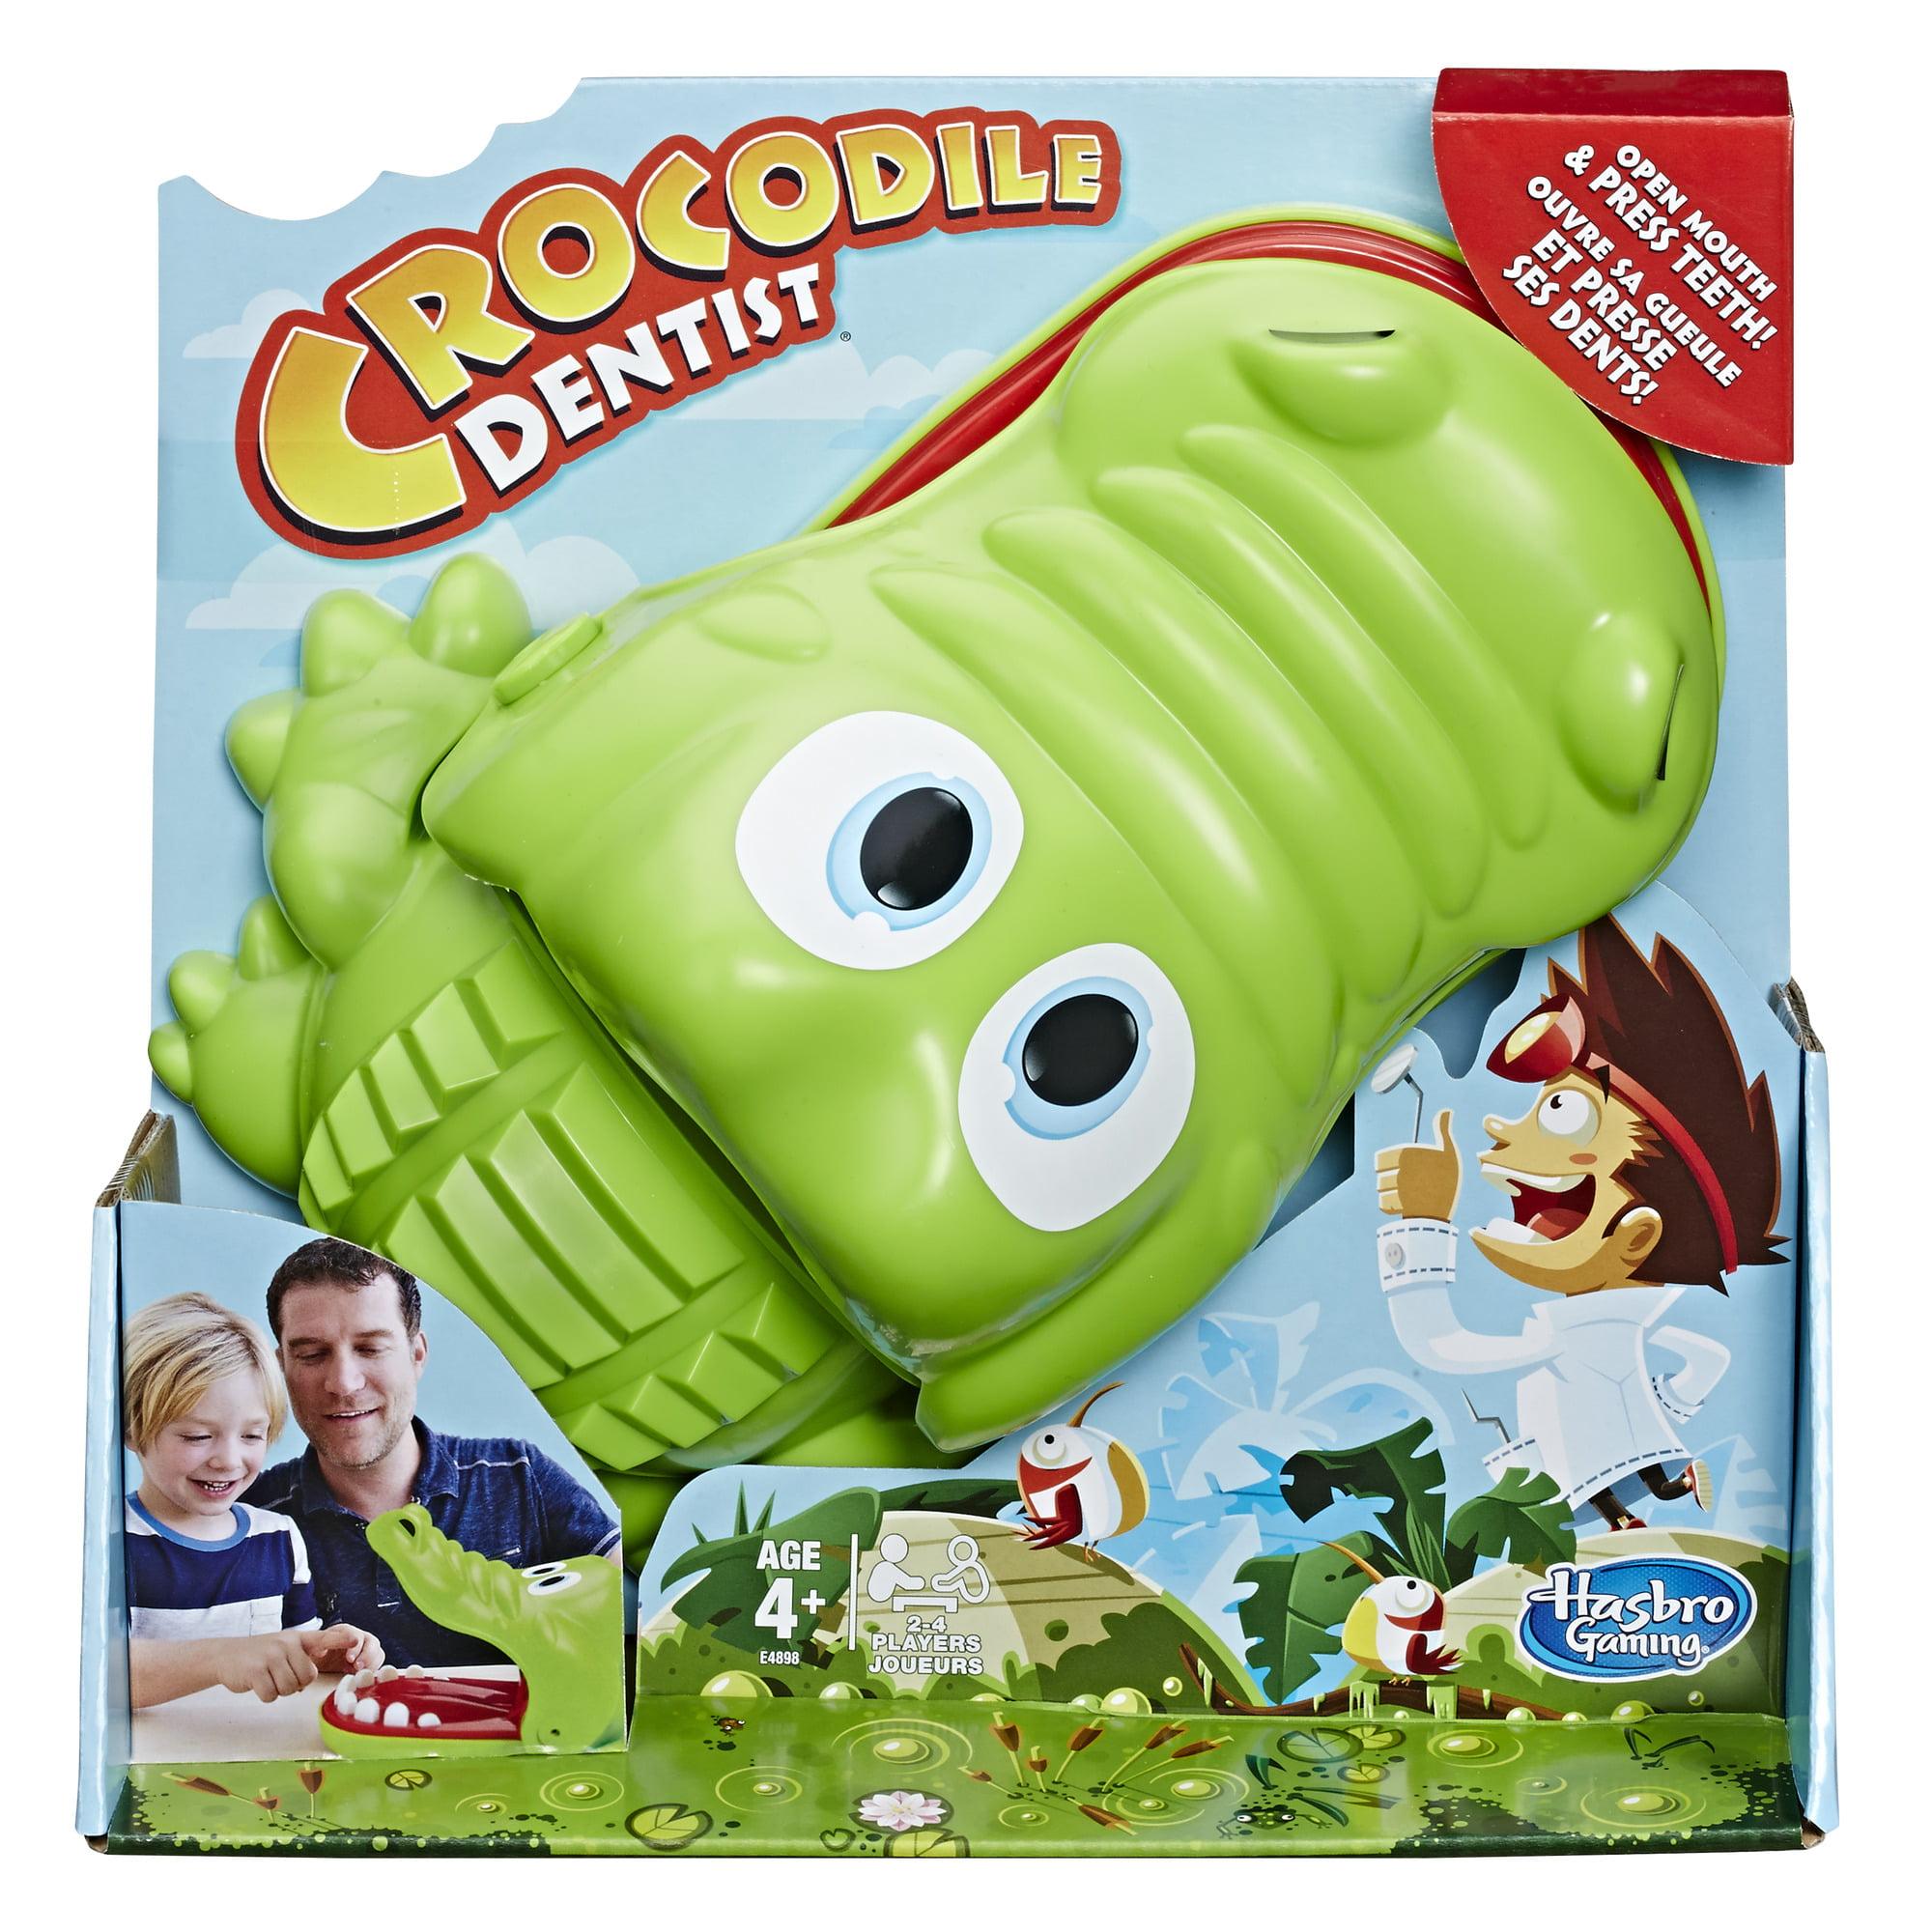 Hasbro Crocodile Dentist Game (ages 4+)